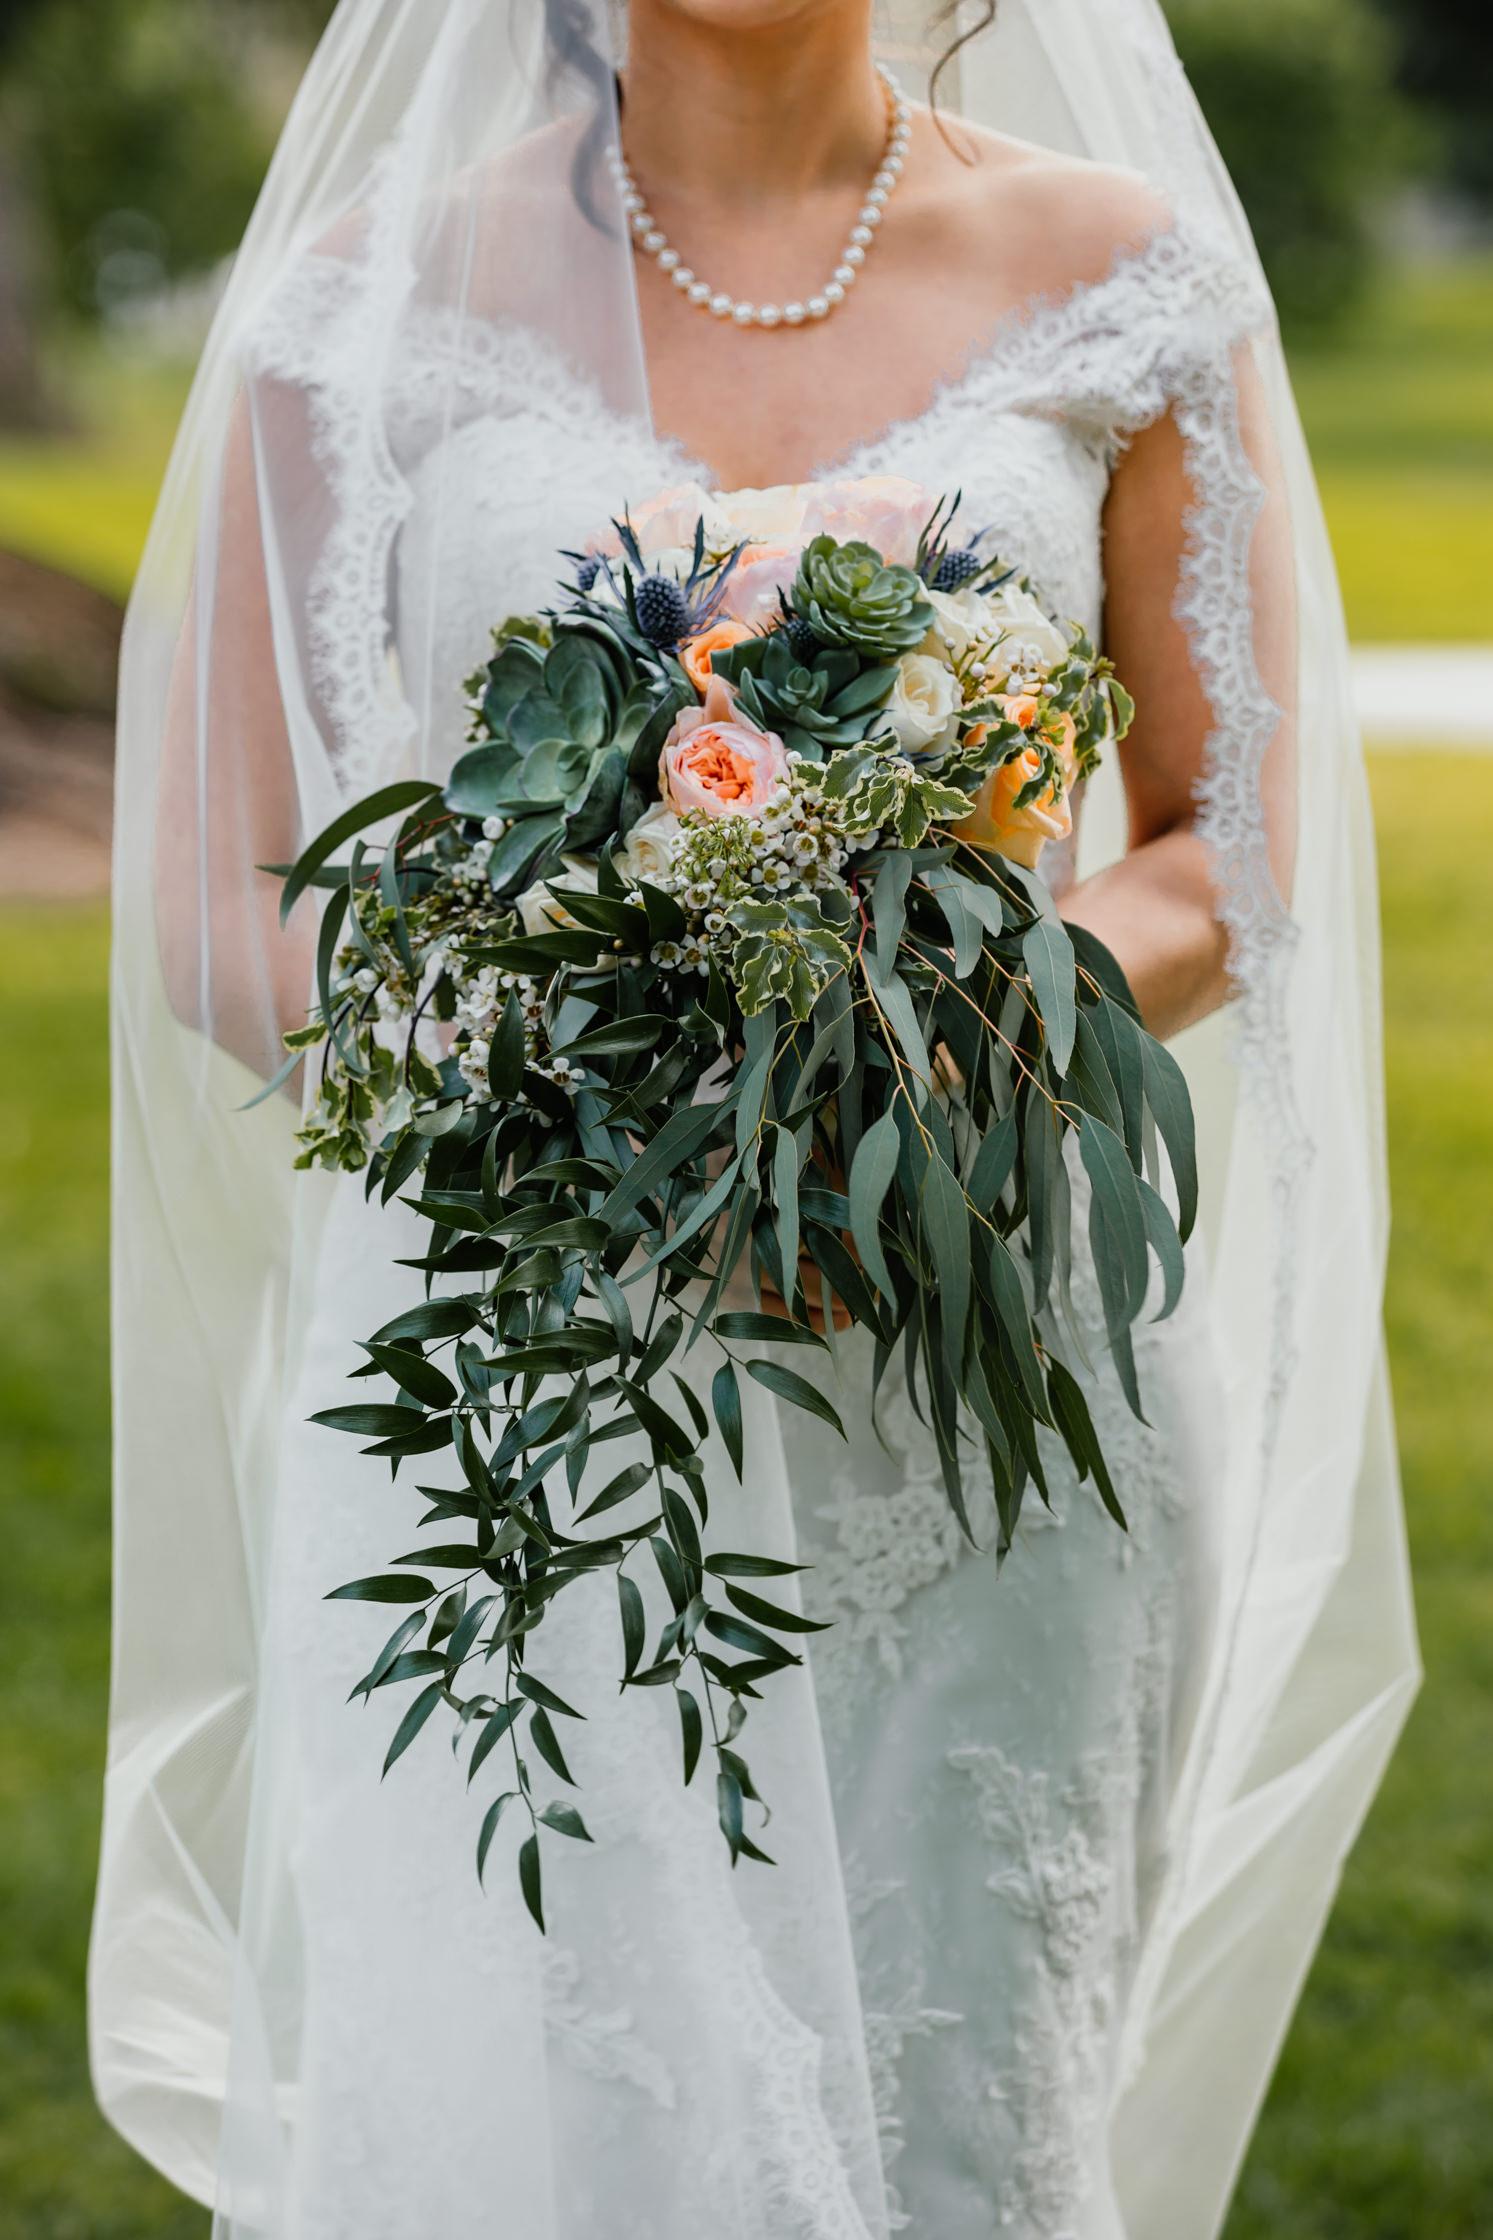 luis_joanna_wedding-56.jpg